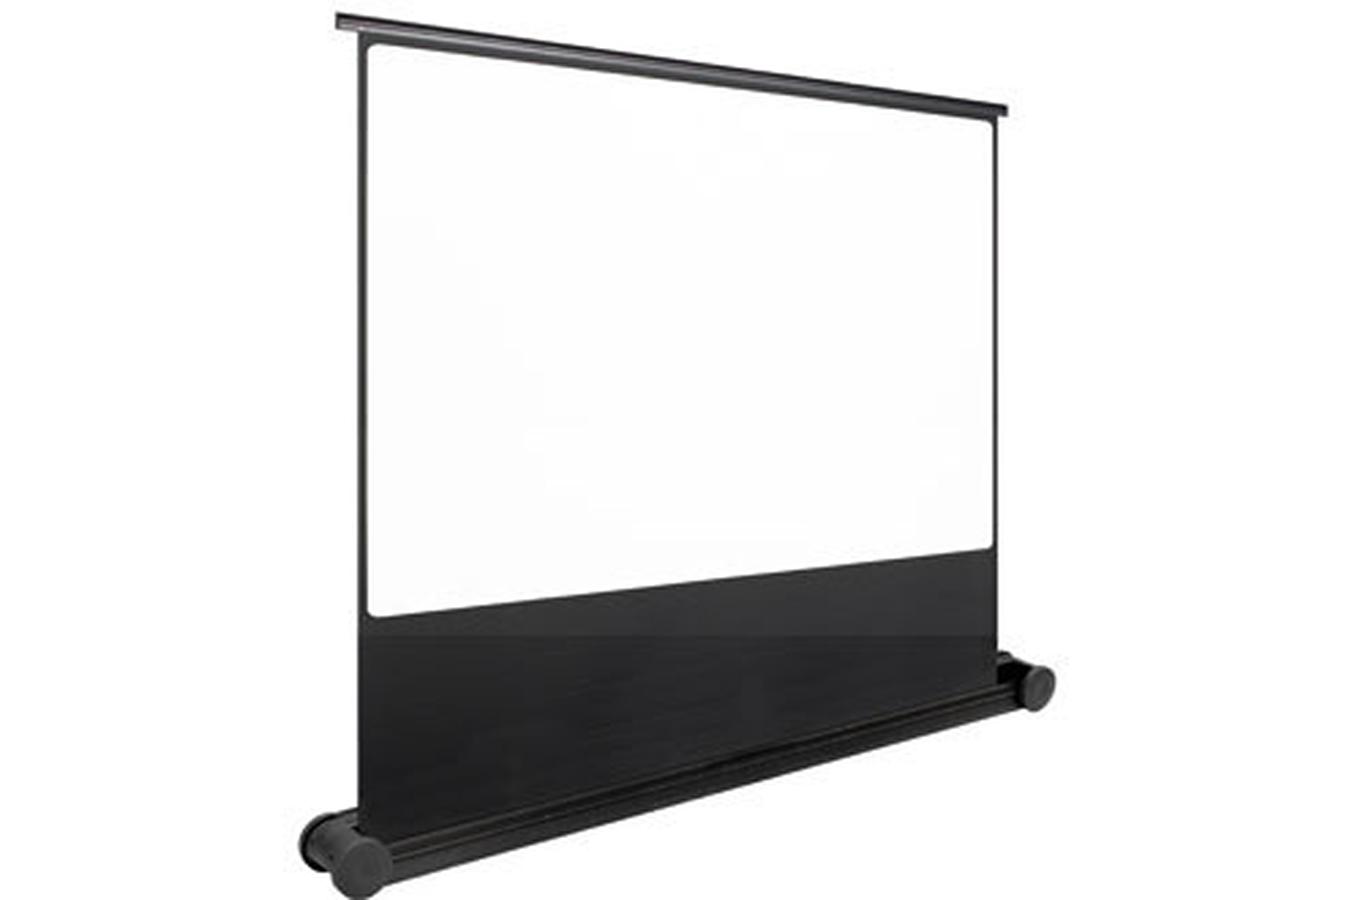 ecran de projection oray but02b1 150x200 2418070 darty. Black Bedroom Furniture Sets. Home Design Ideas